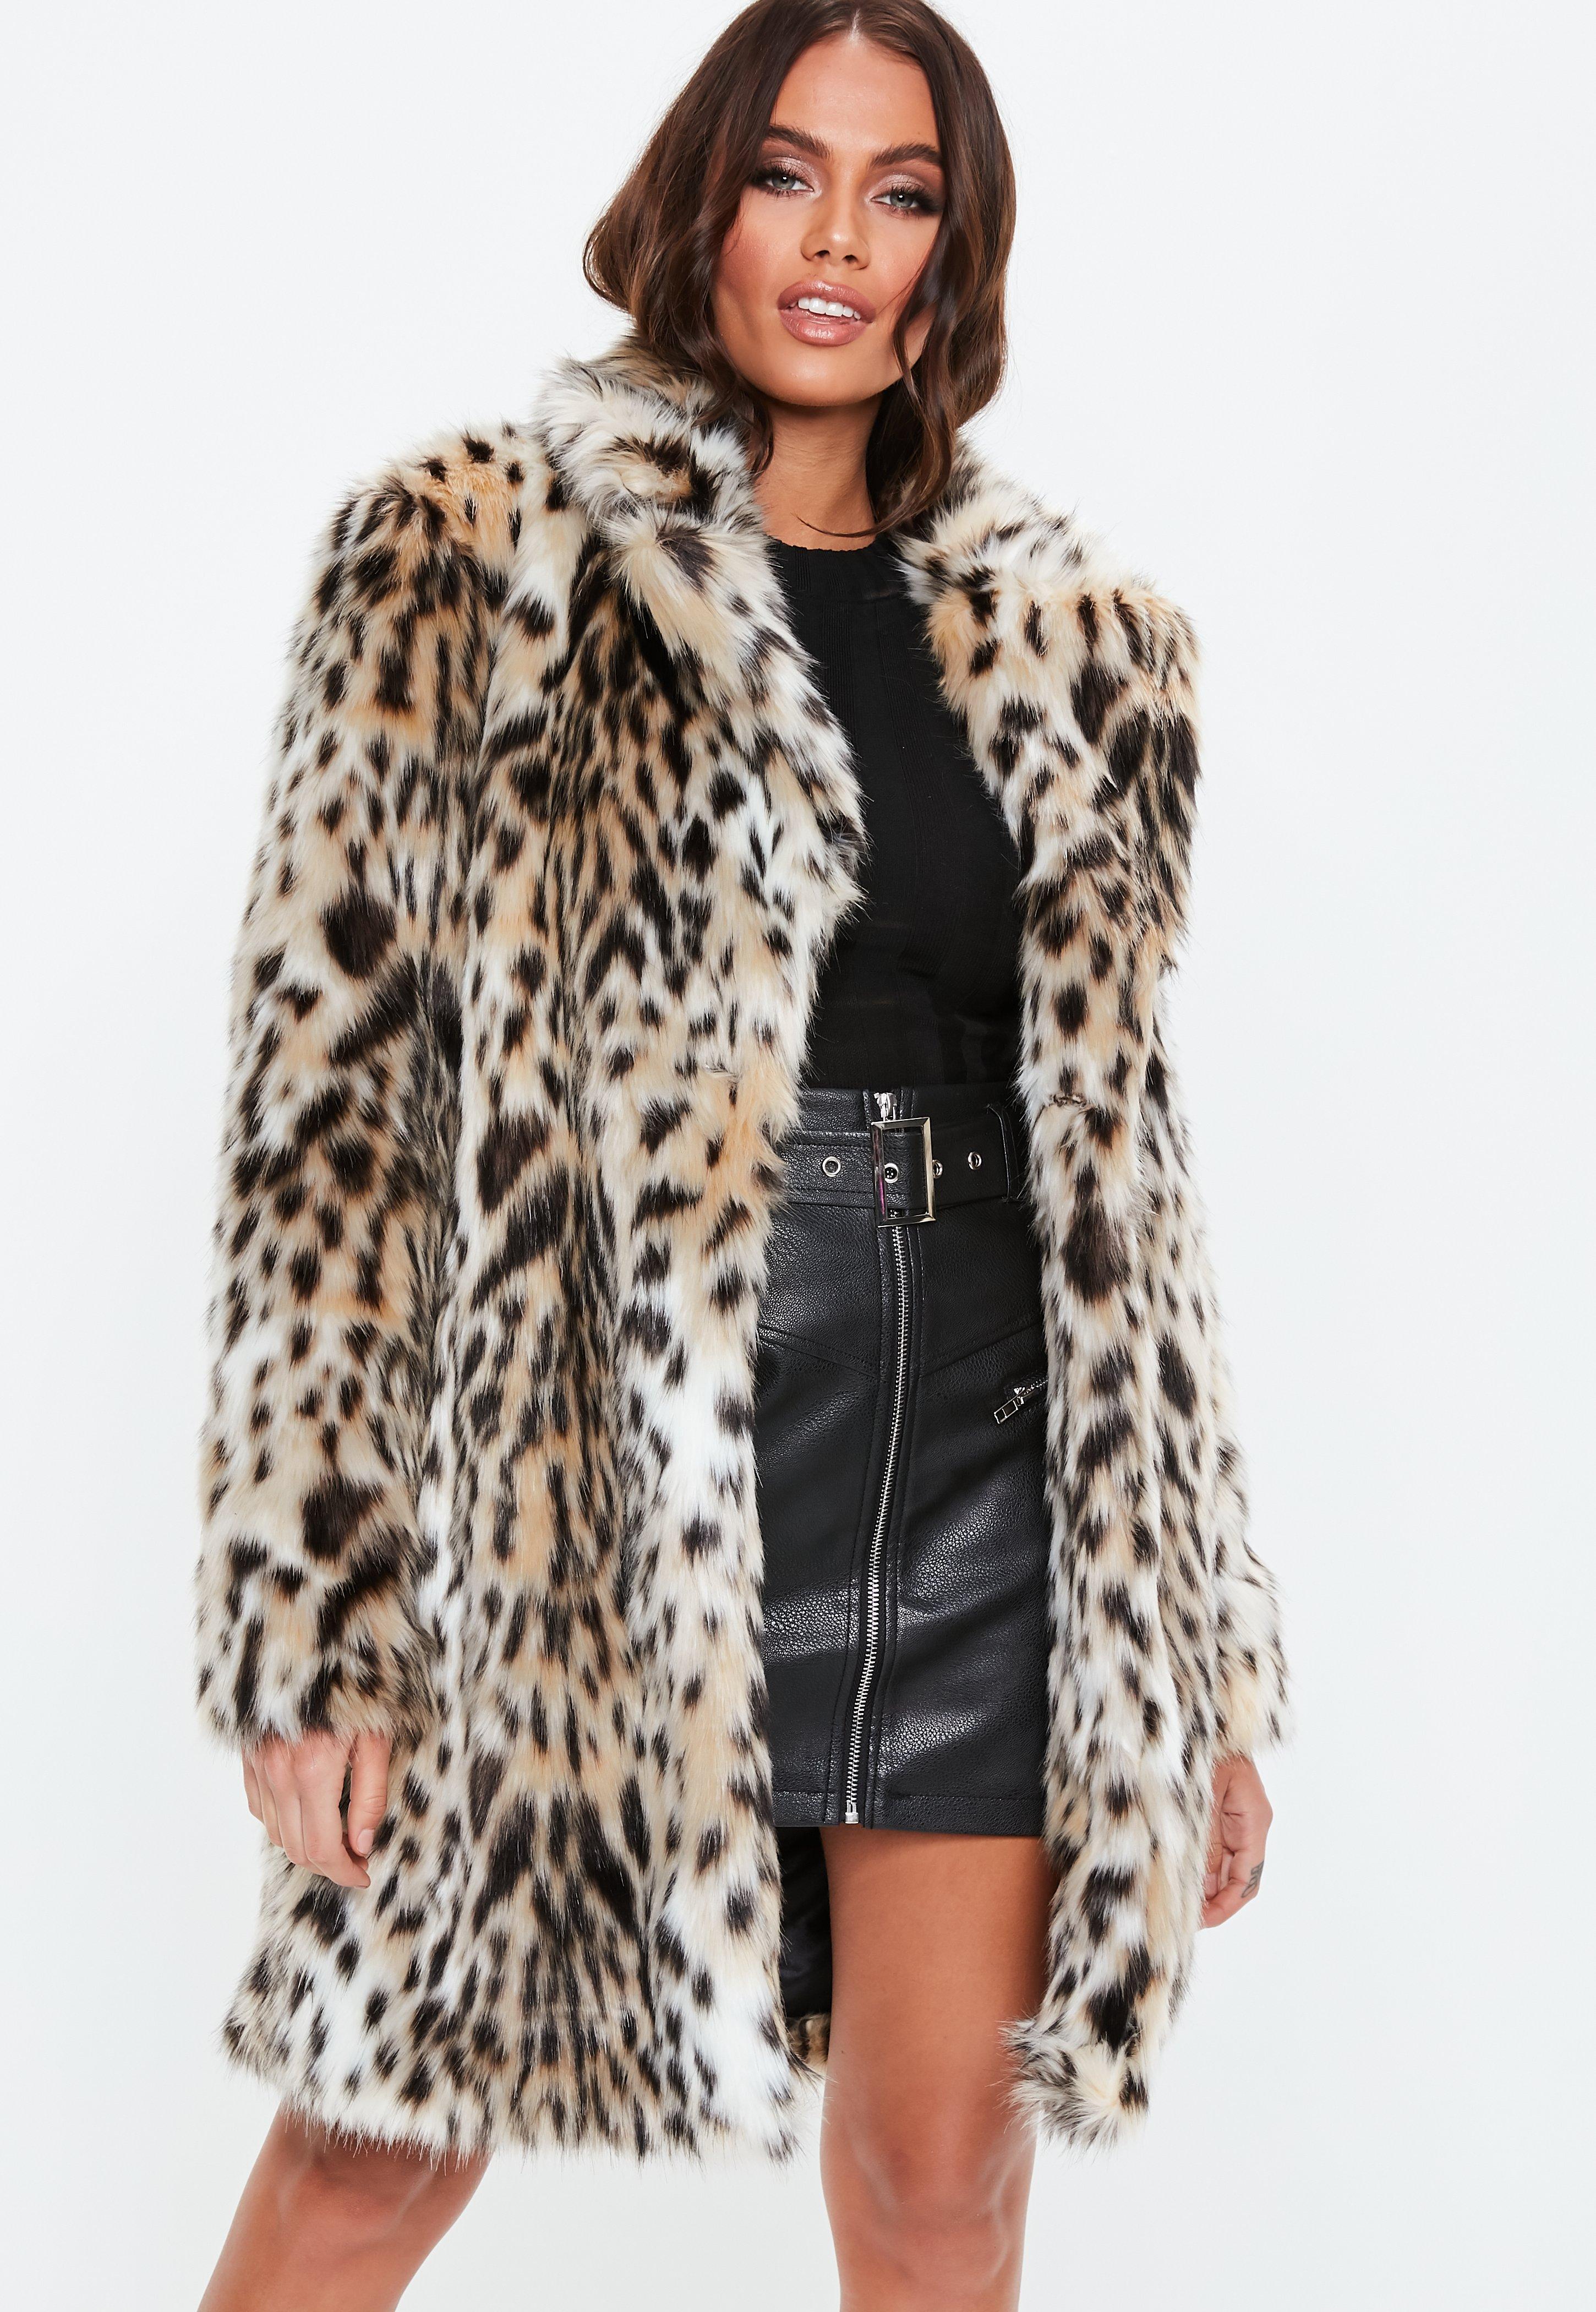 53584c385467 European Style Women Jacket Fashion Faux Leopard Print Fur Jacket 2018  Autumn Winter New Slim Fit